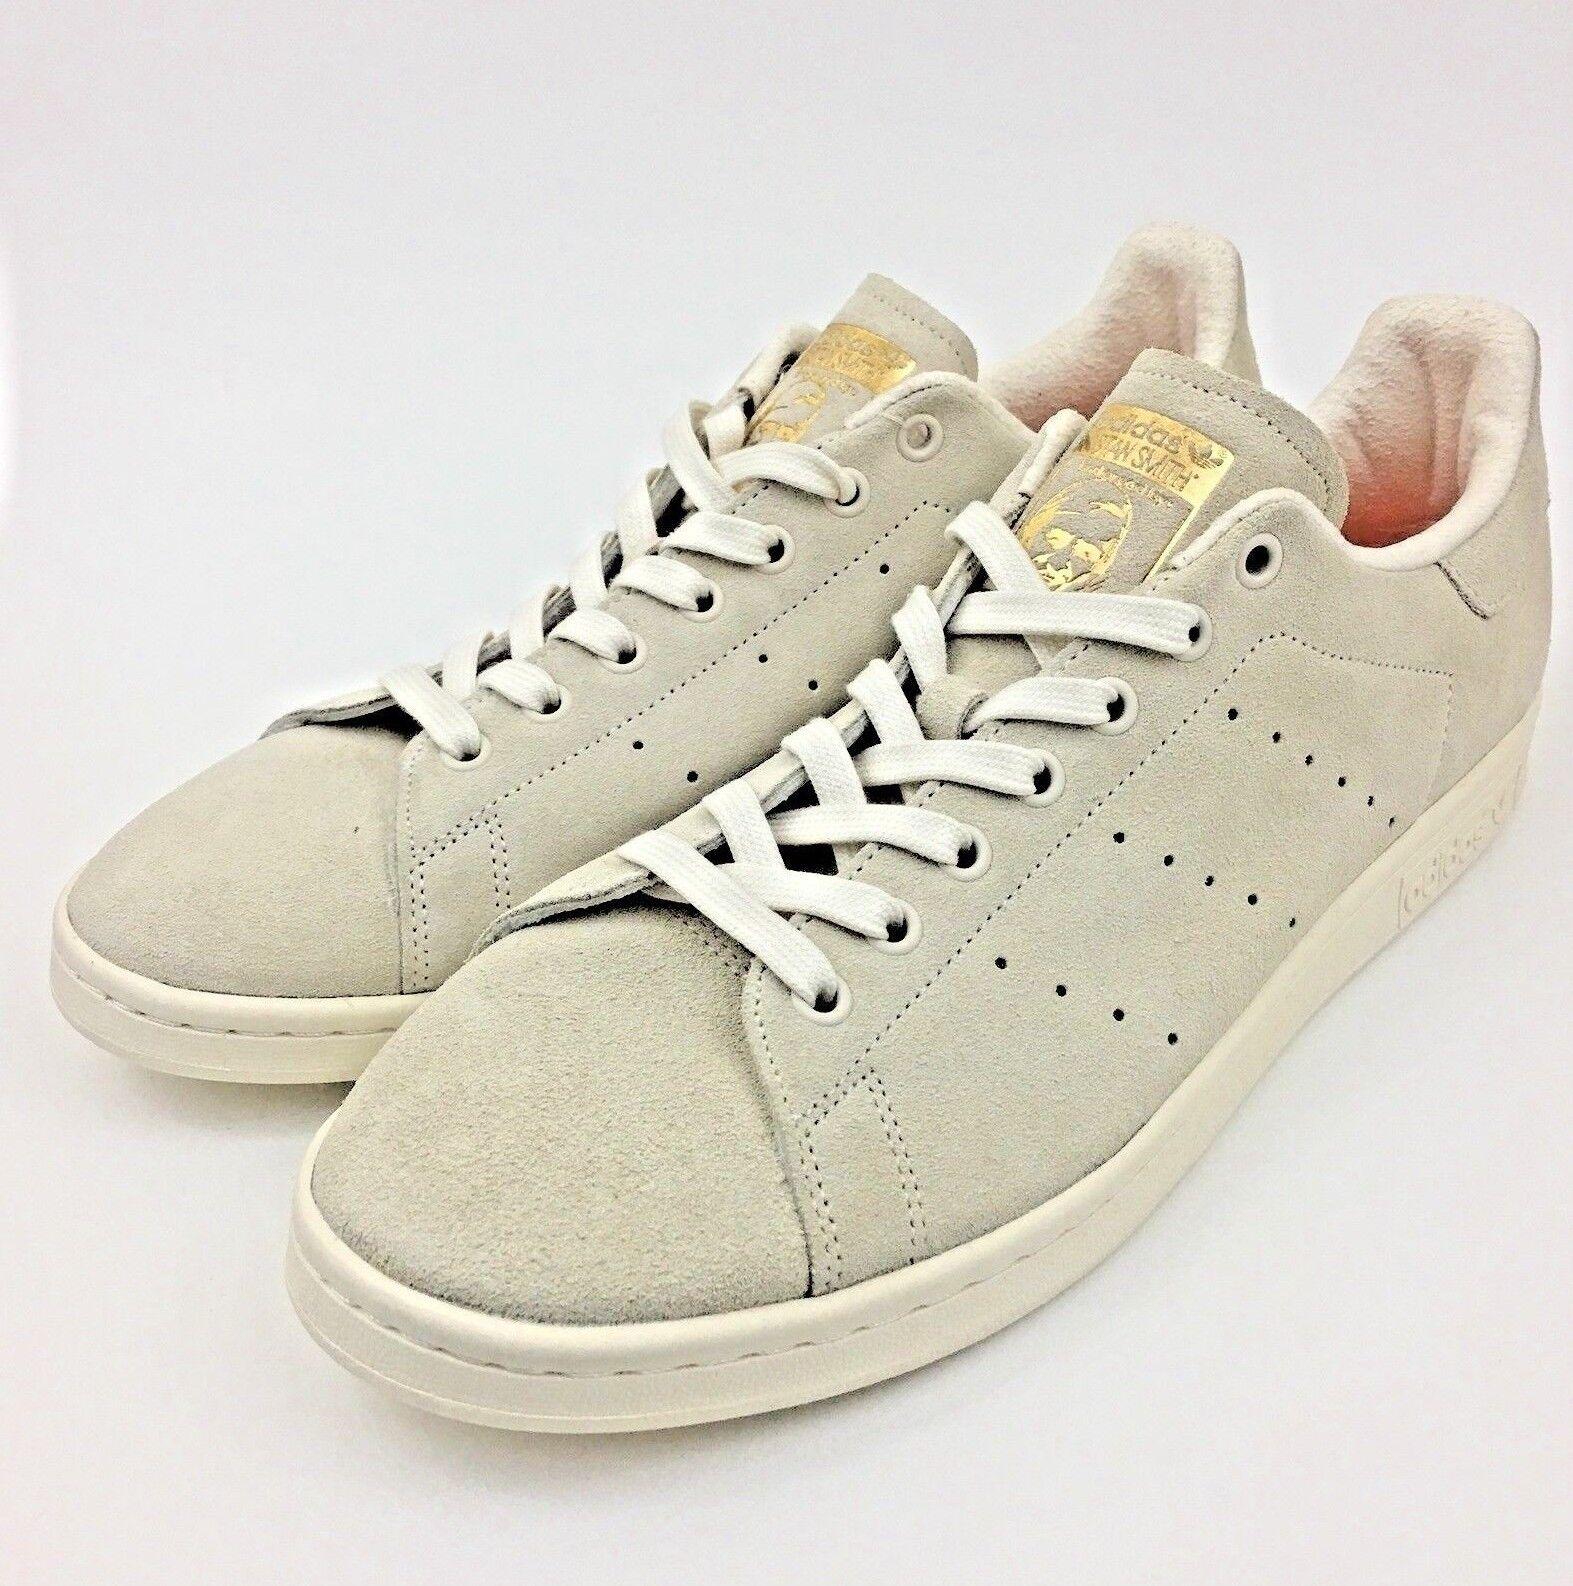 Adidas Originals Stan Smith Suede Trainers Sneaker White BA7441 Men Size US 11.5